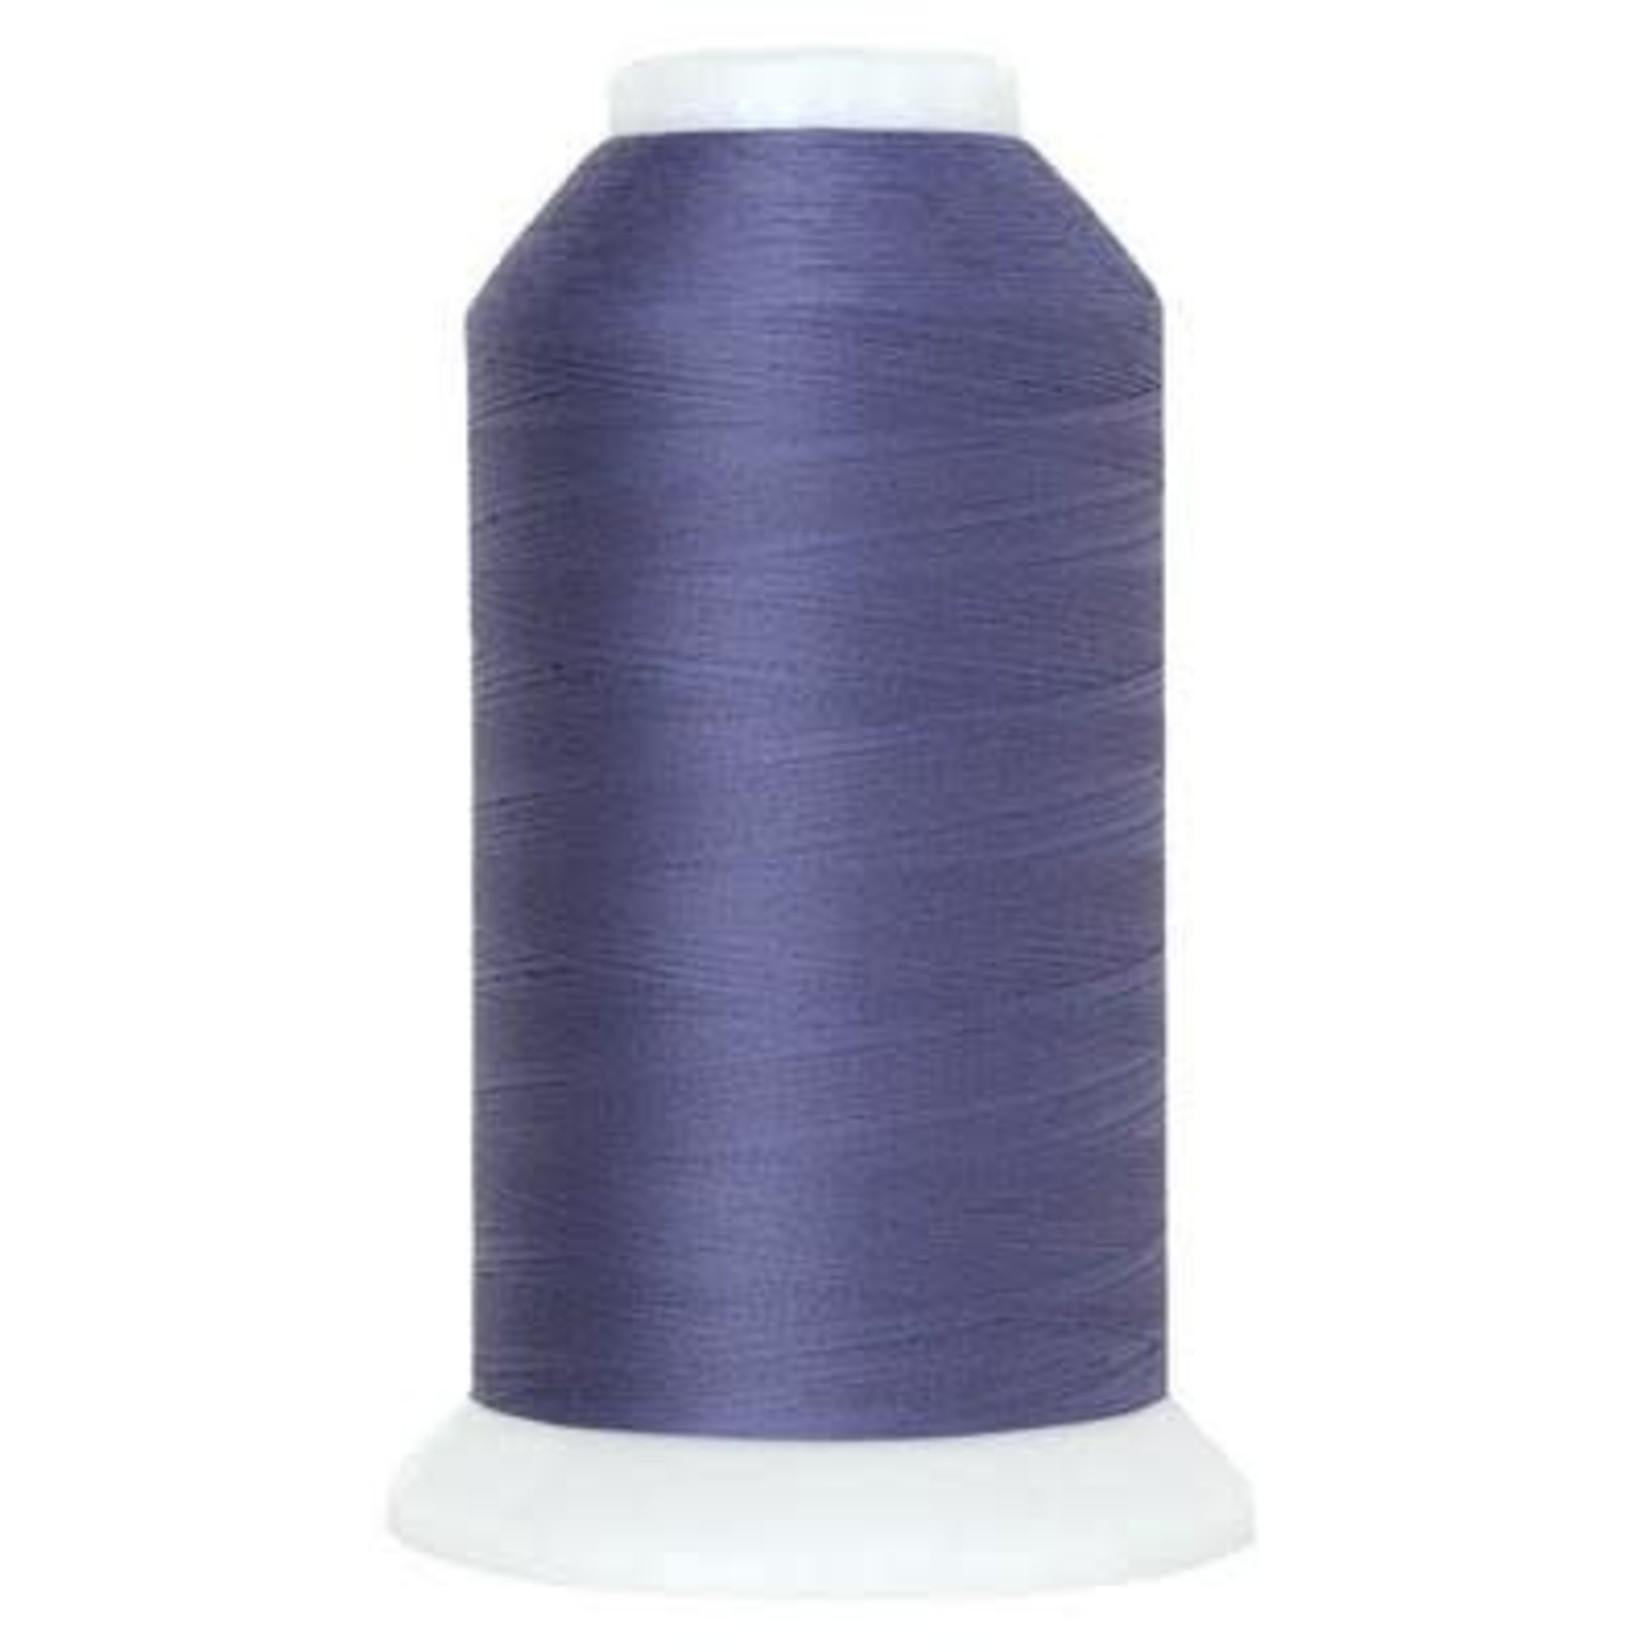 Superior Threads So Fine! 440 Lilac 3280